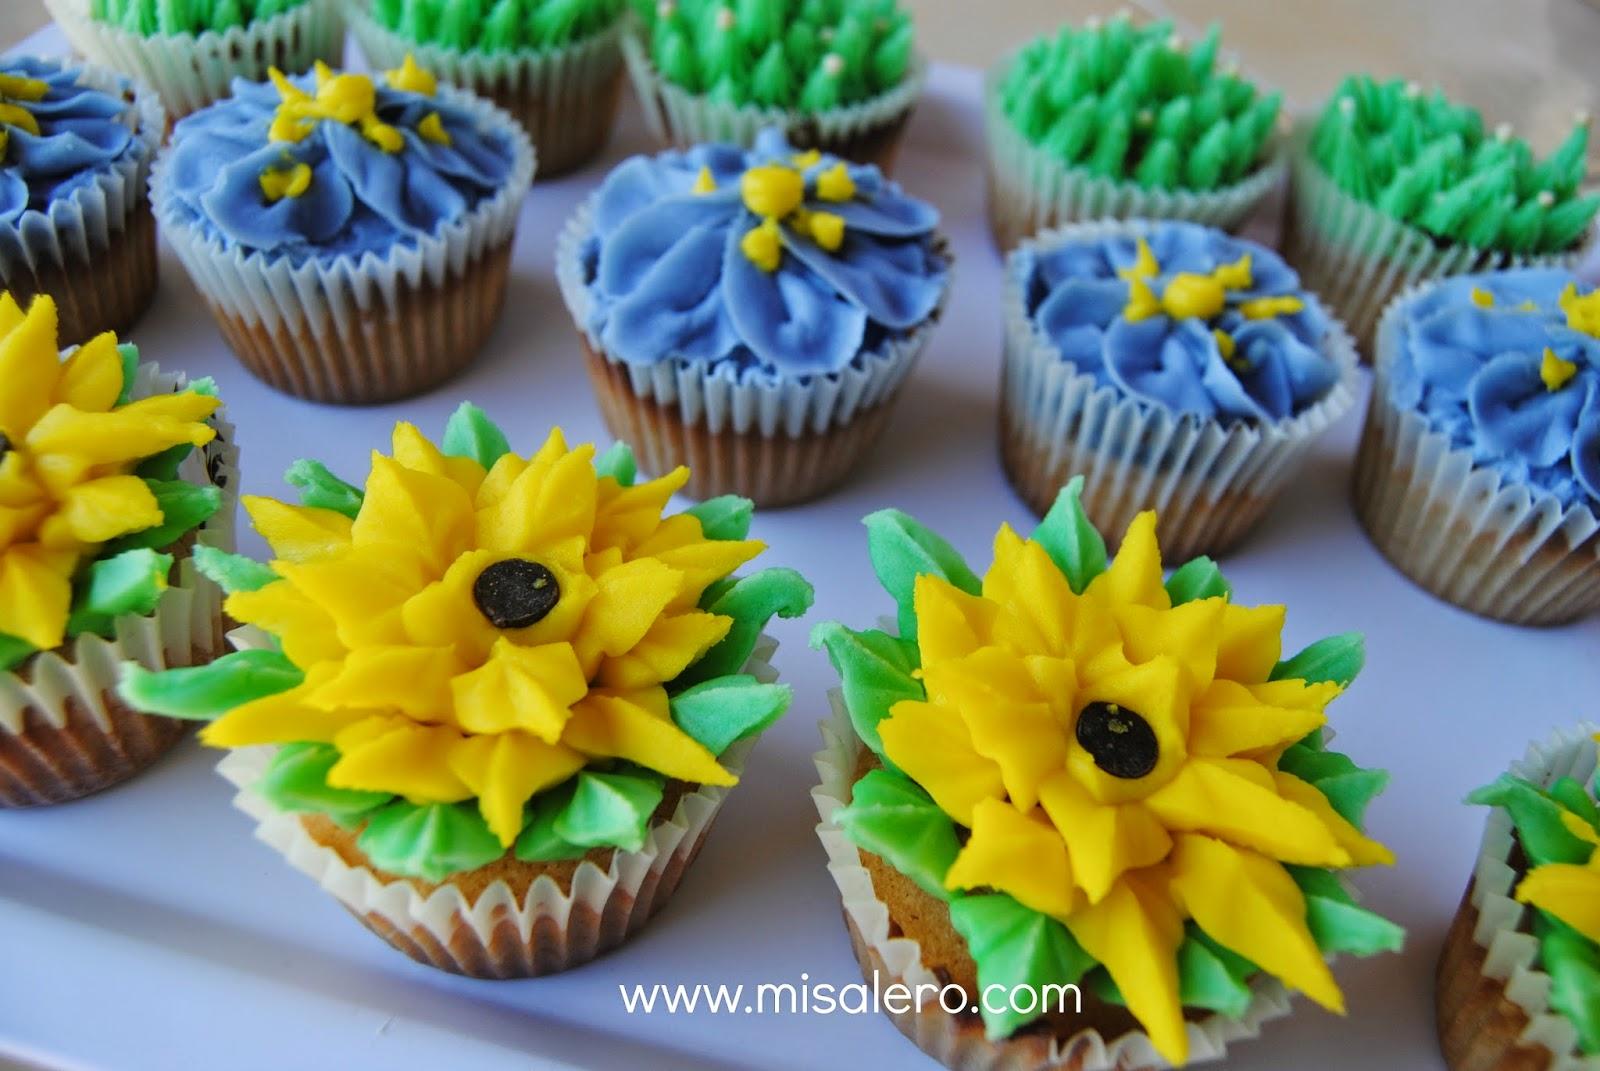 http://misalero.com/2014/12/cupcakes-de-vainilla-de-peggy-porshen.html